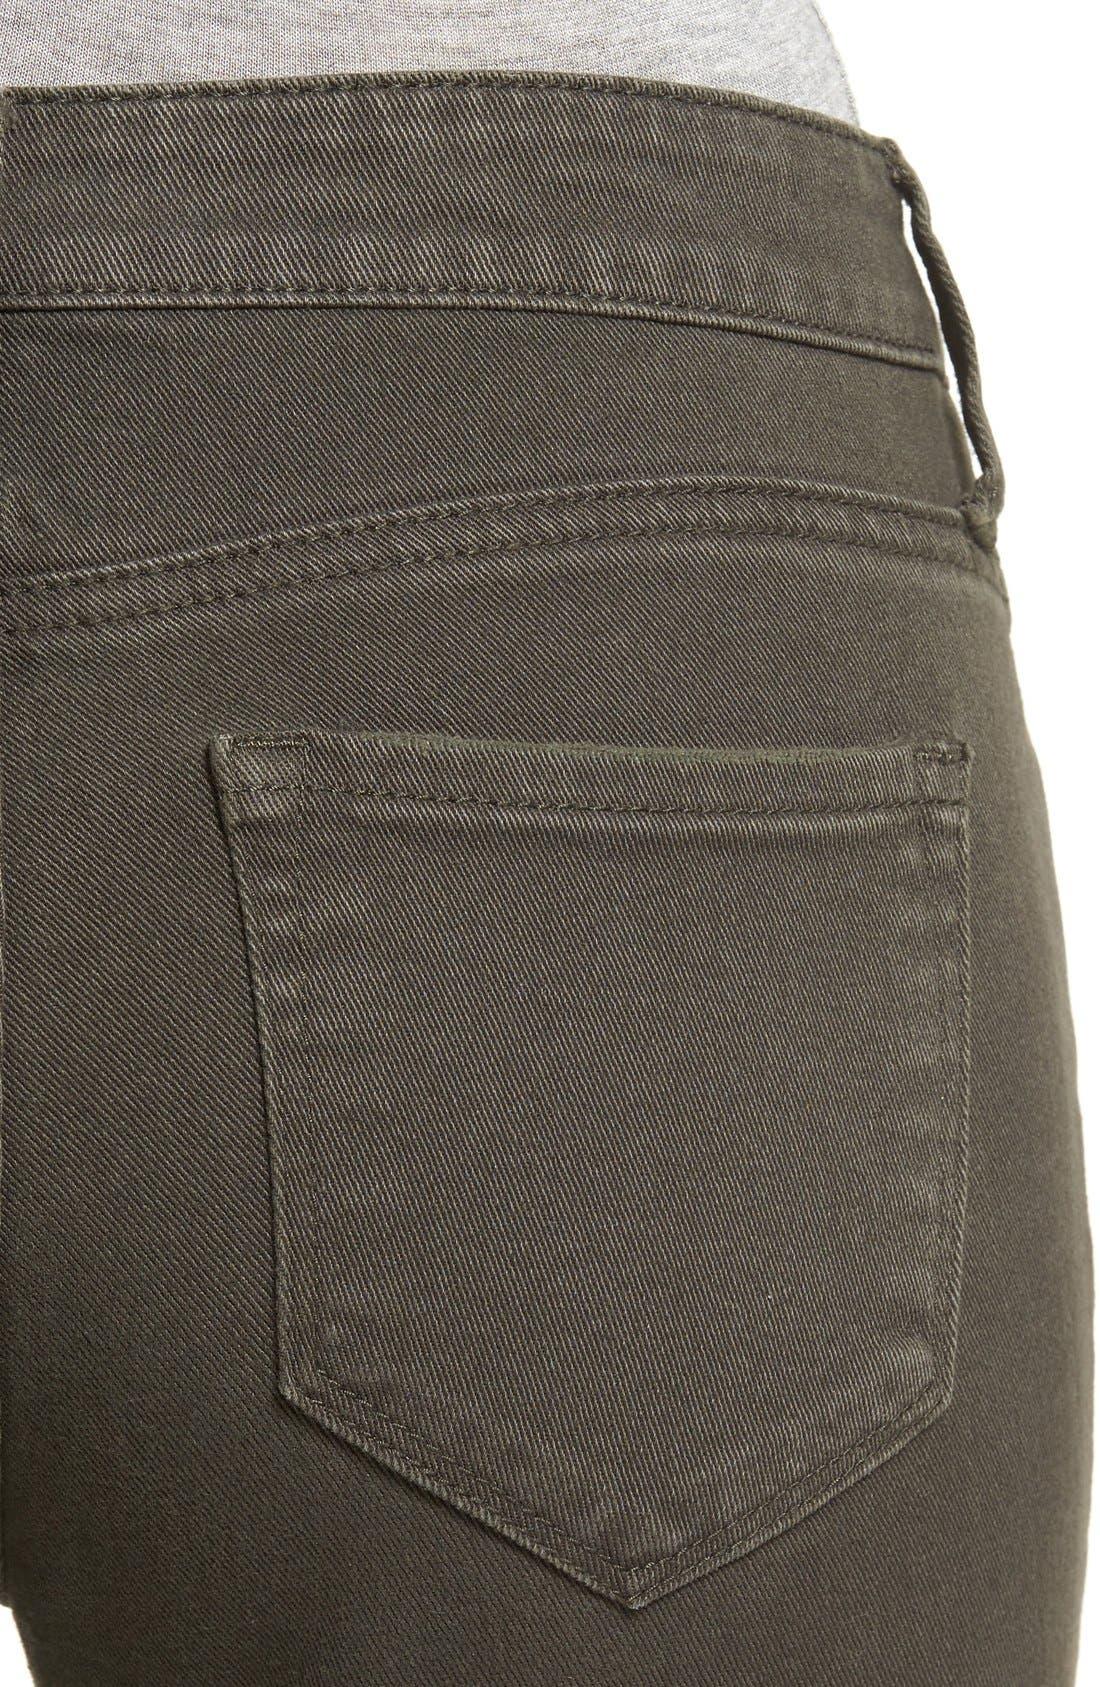 Alternate Image 4  - STS Blue 'Piper' Deconstructed Skinny Jeans (Dark Olive)